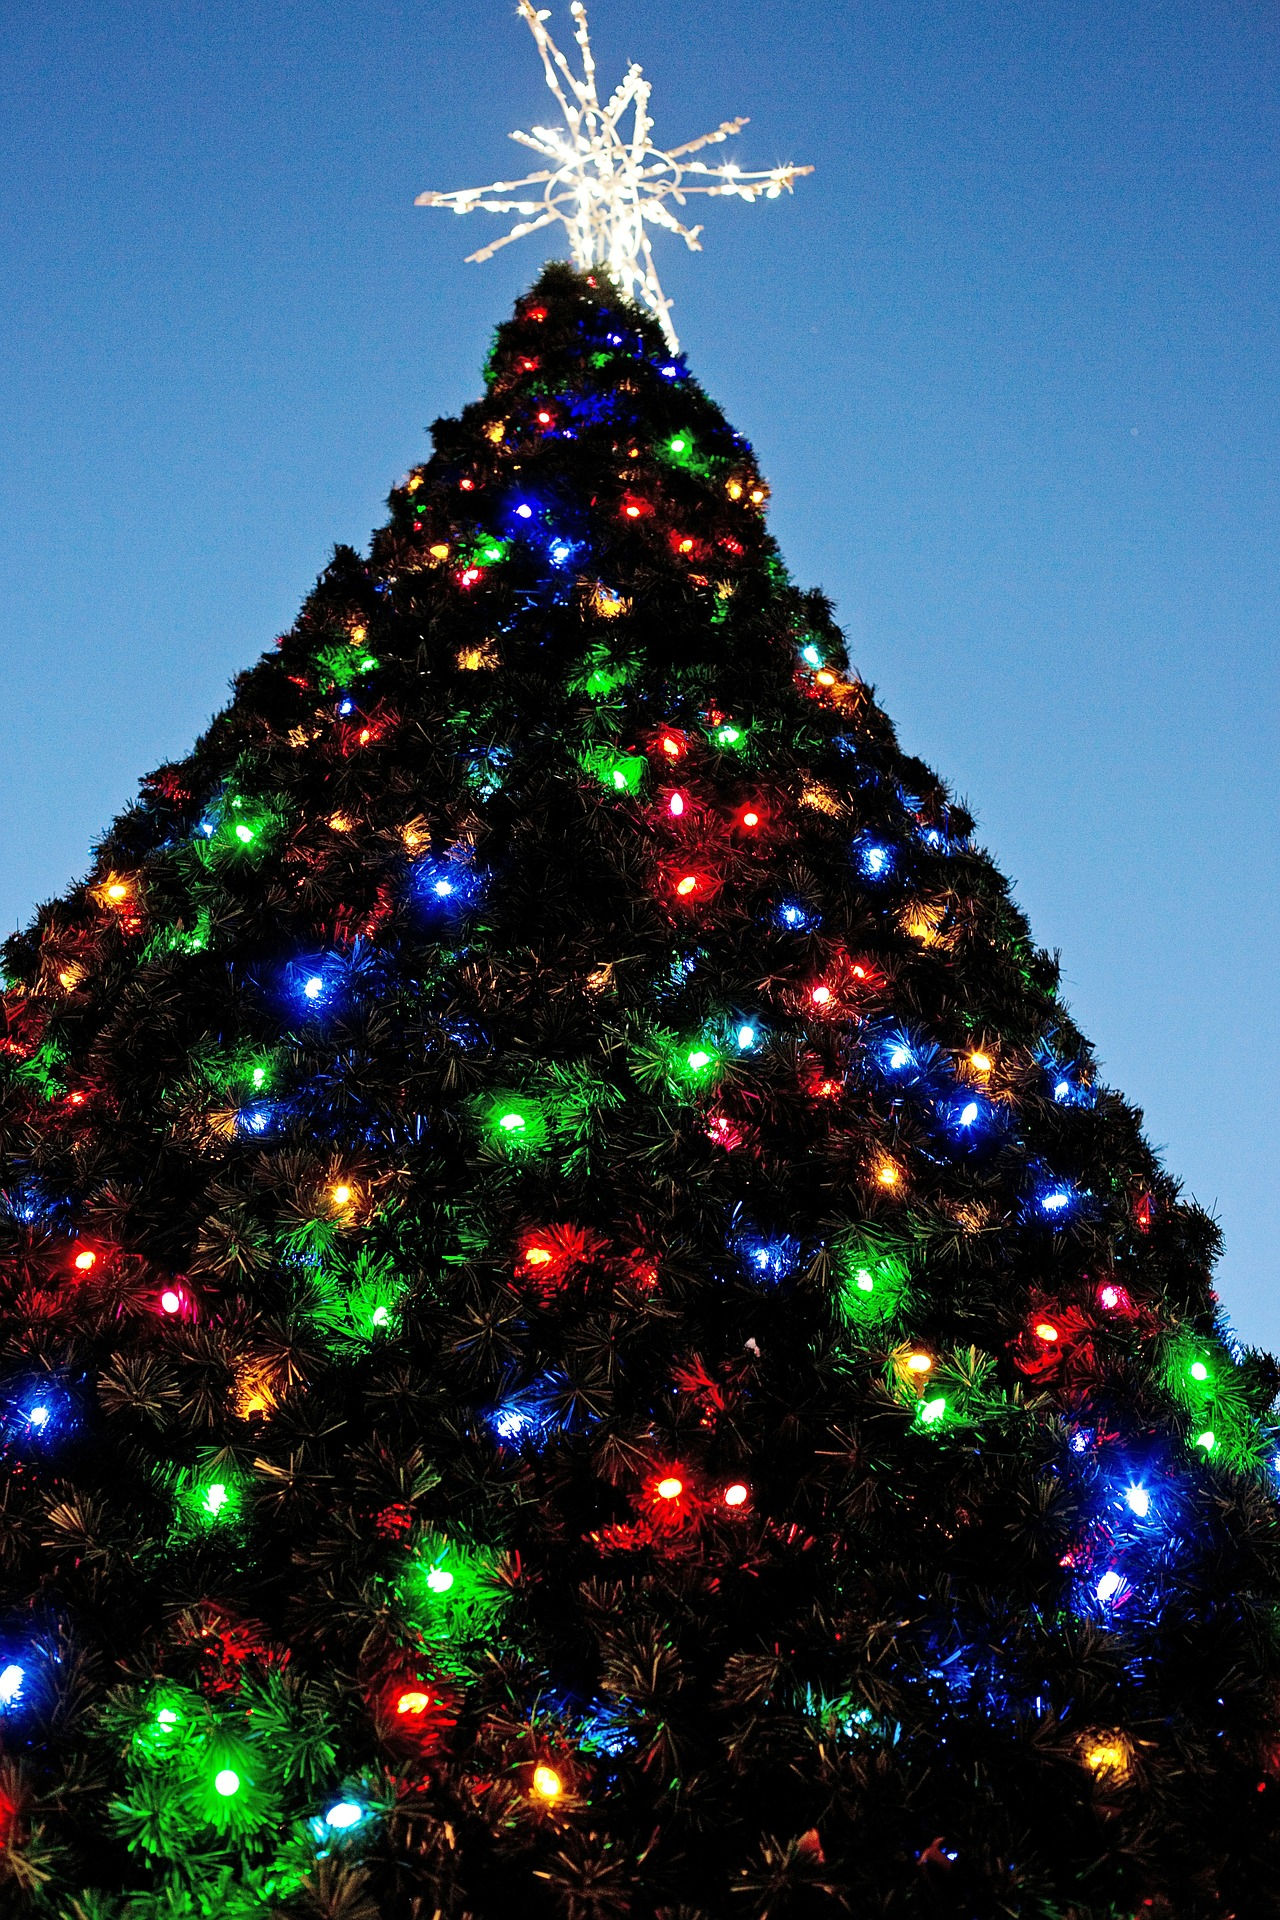 Christmas Tree, Celebrate, Celebration, Christmas, Design, HQ Photo